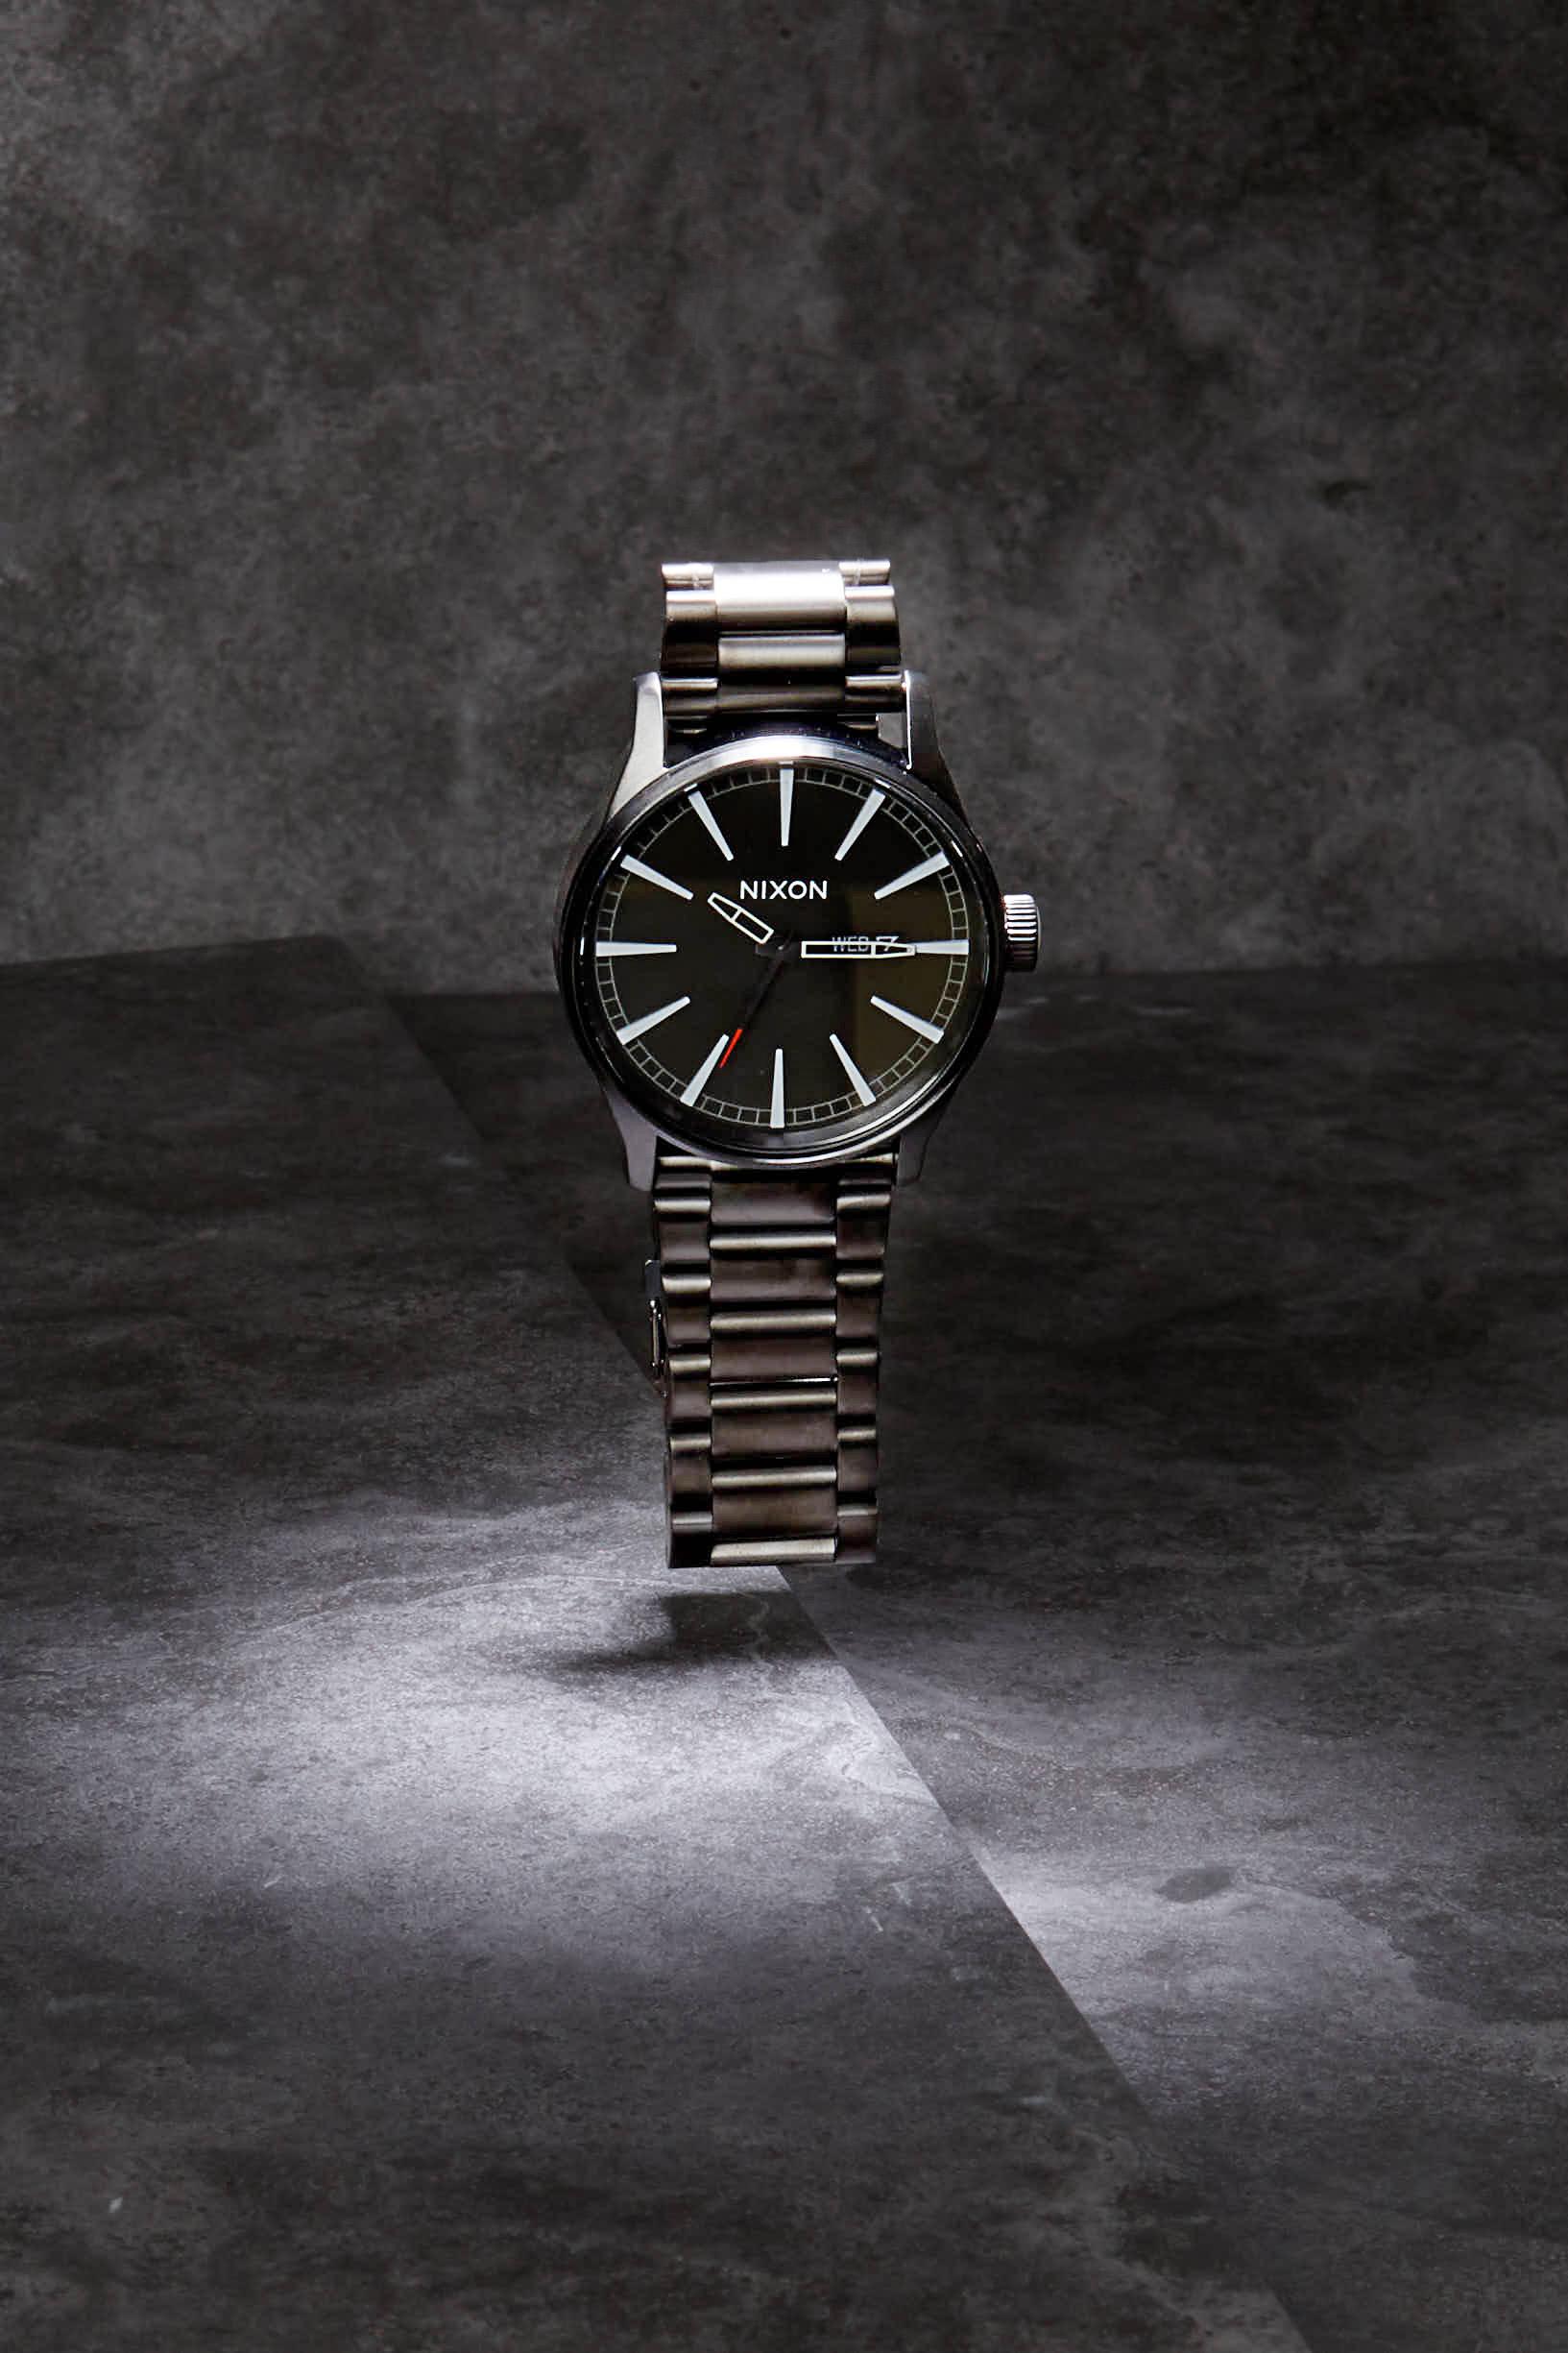 nixon watches (freestyleXtreme mag feature)